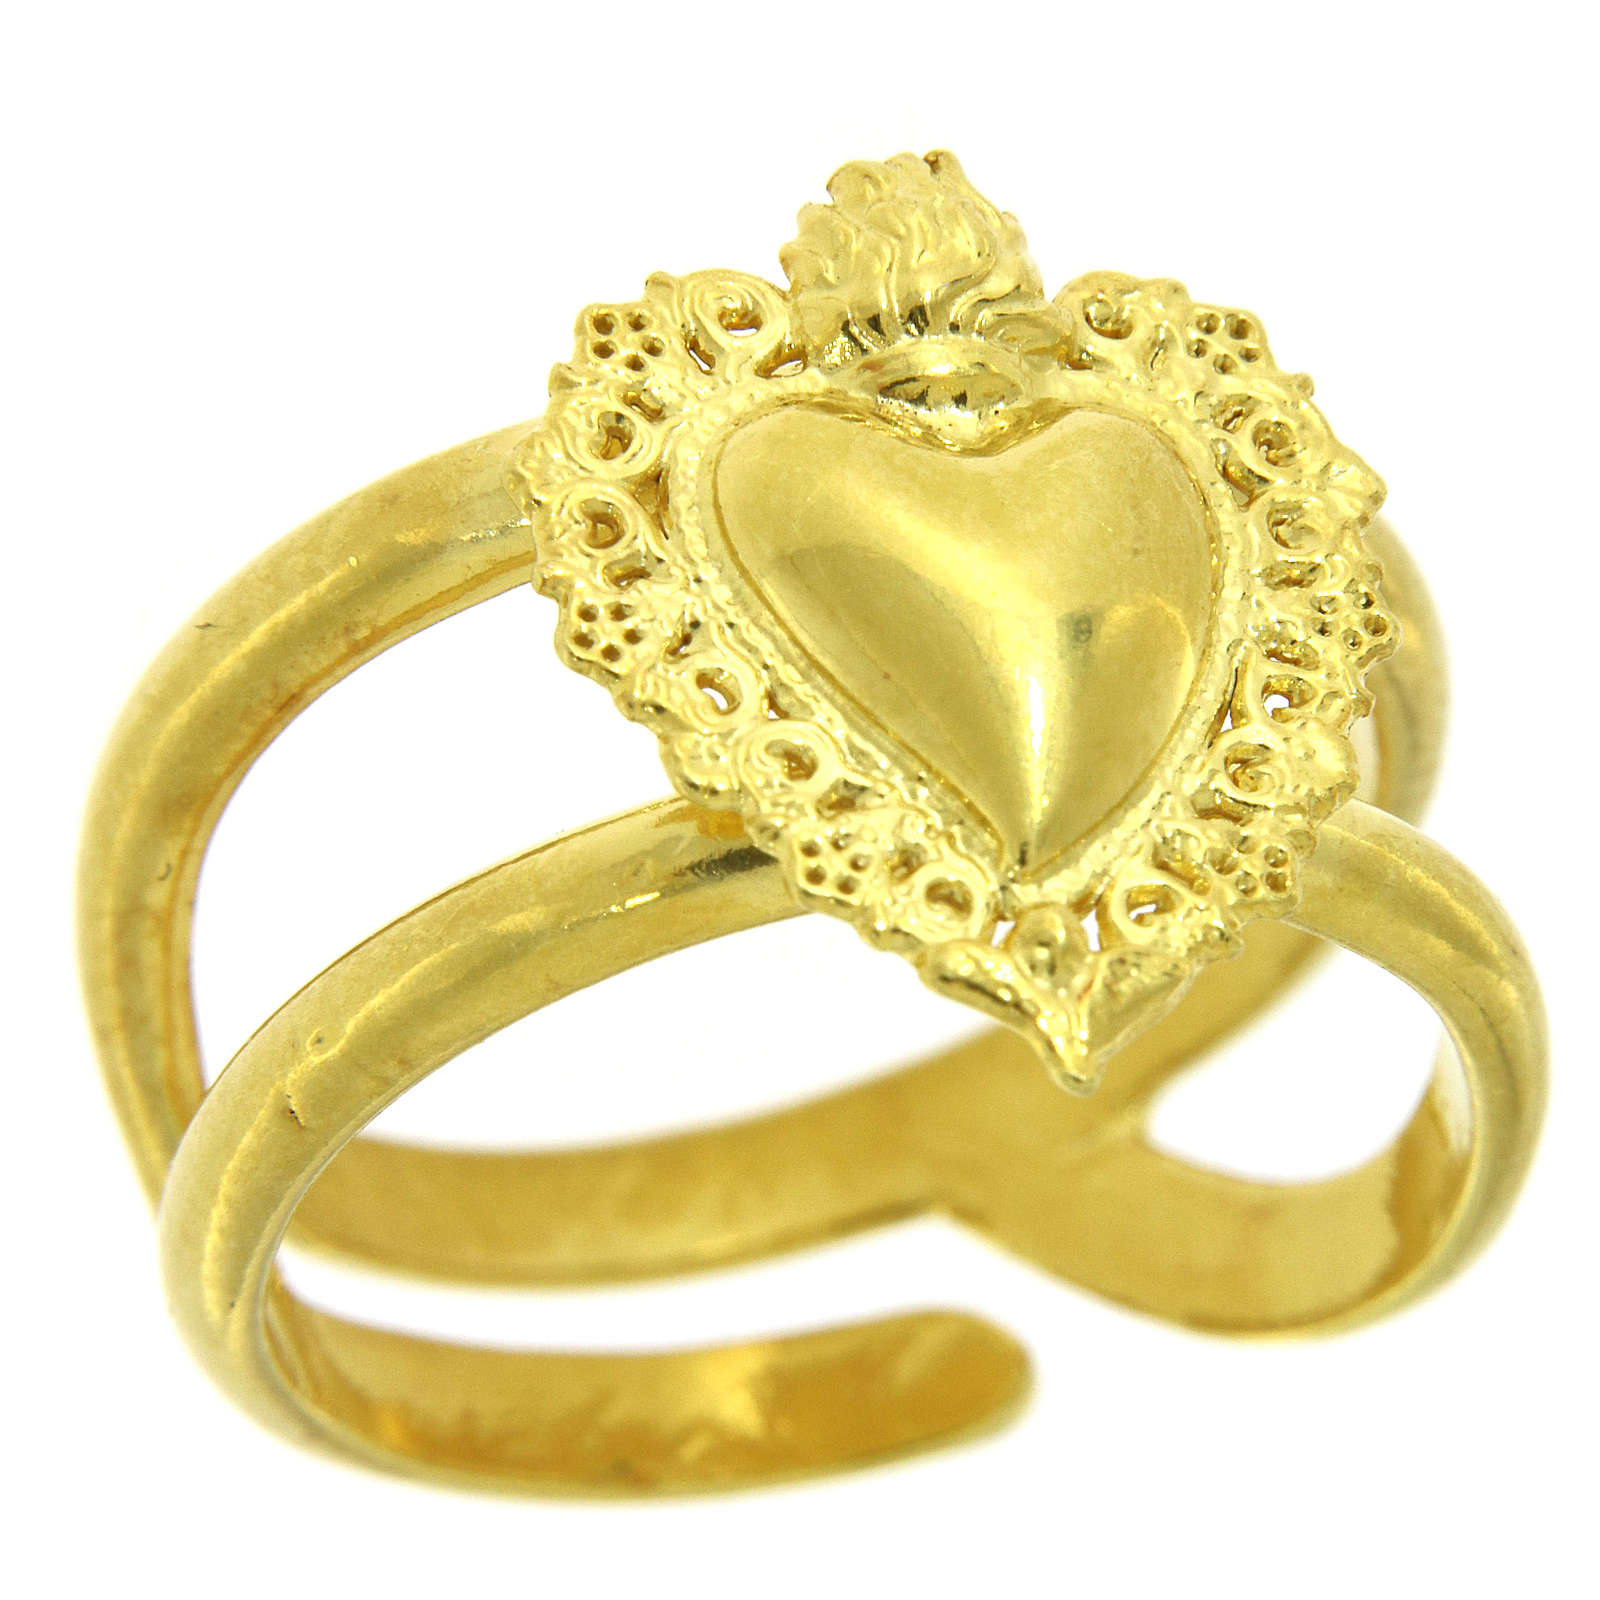 Anillo ajustable dorado con corazón votivo vacío de plata 925 3